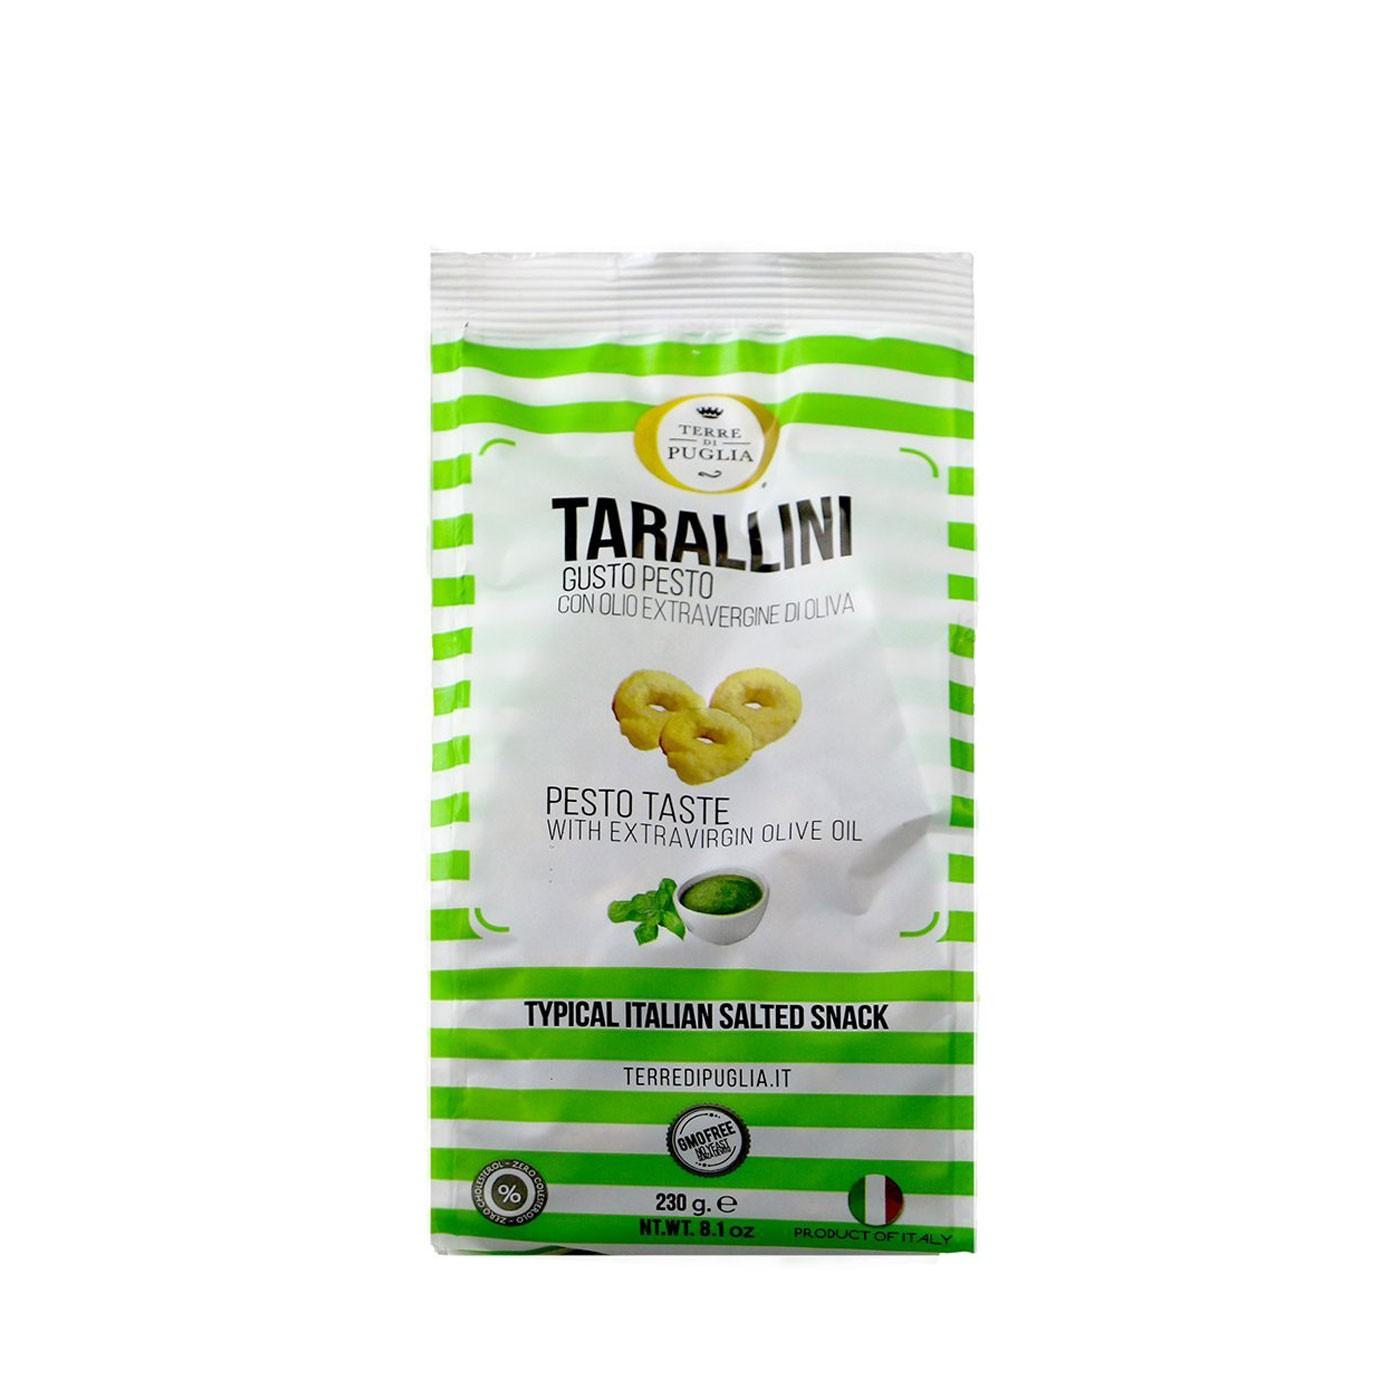 Pesto Tarallini Crackers 8.1 oz